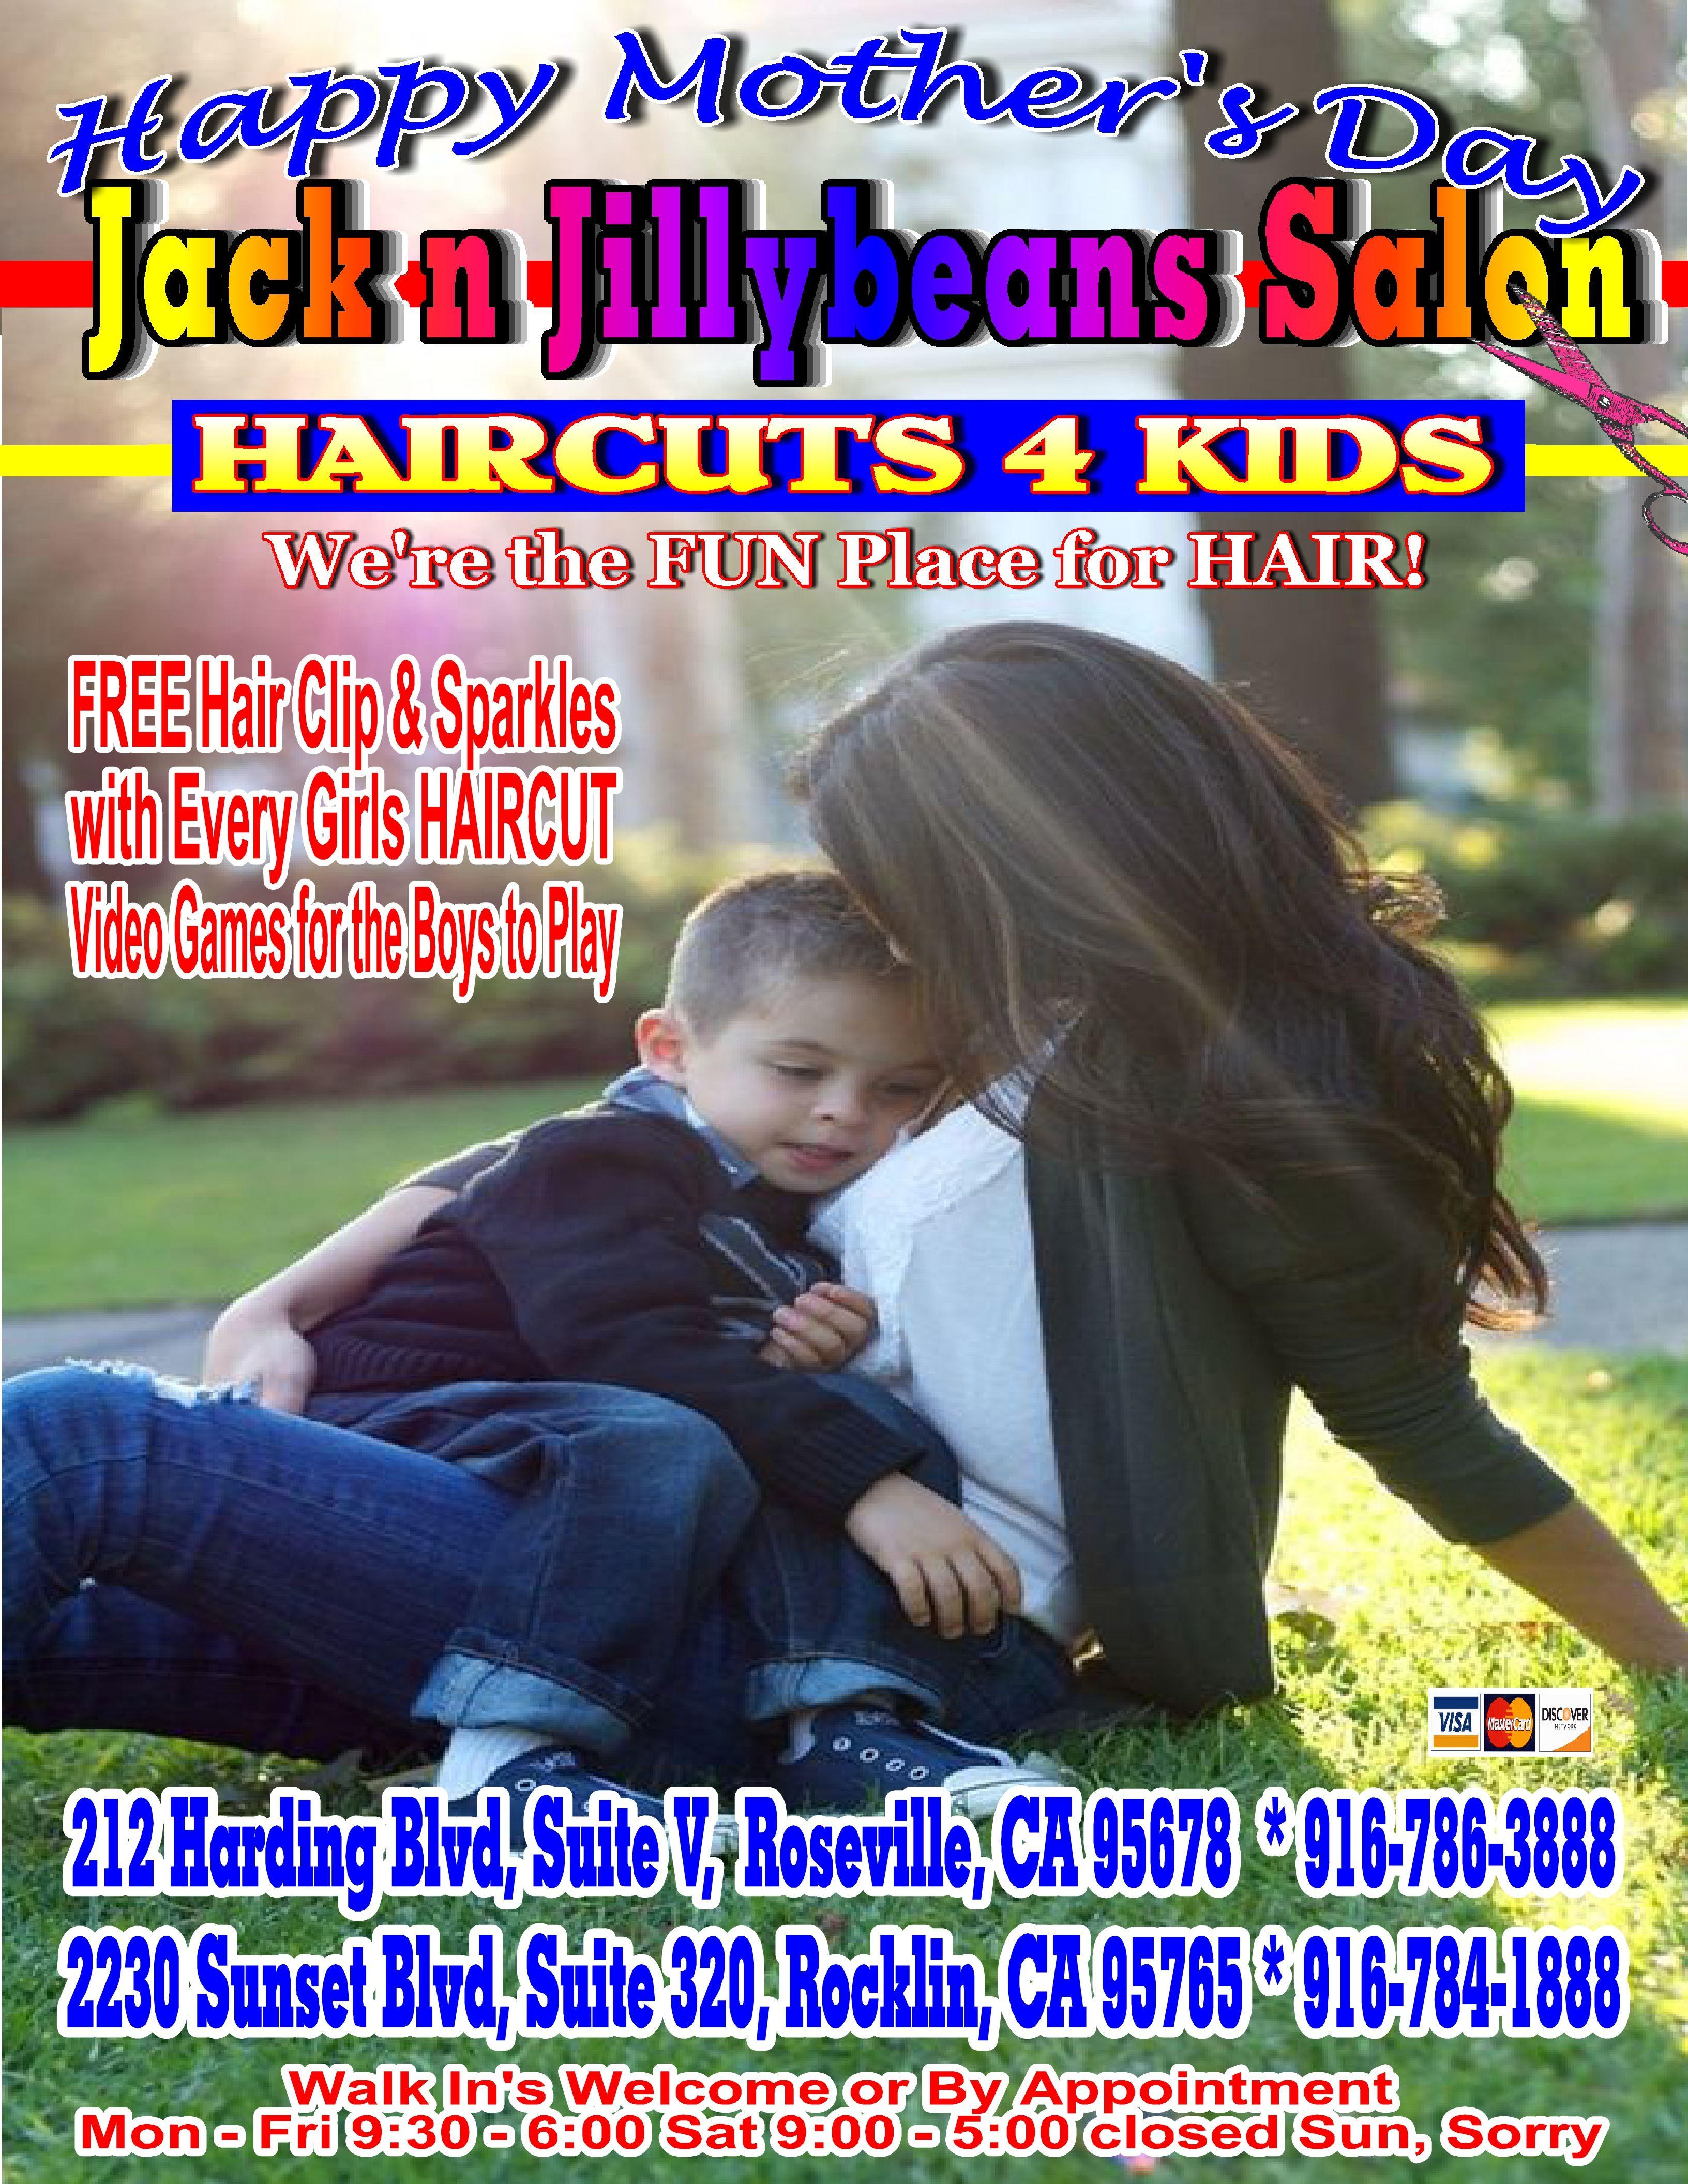 Pin by Jack n Jillybeans Salon on Motherus Day  Pinterest